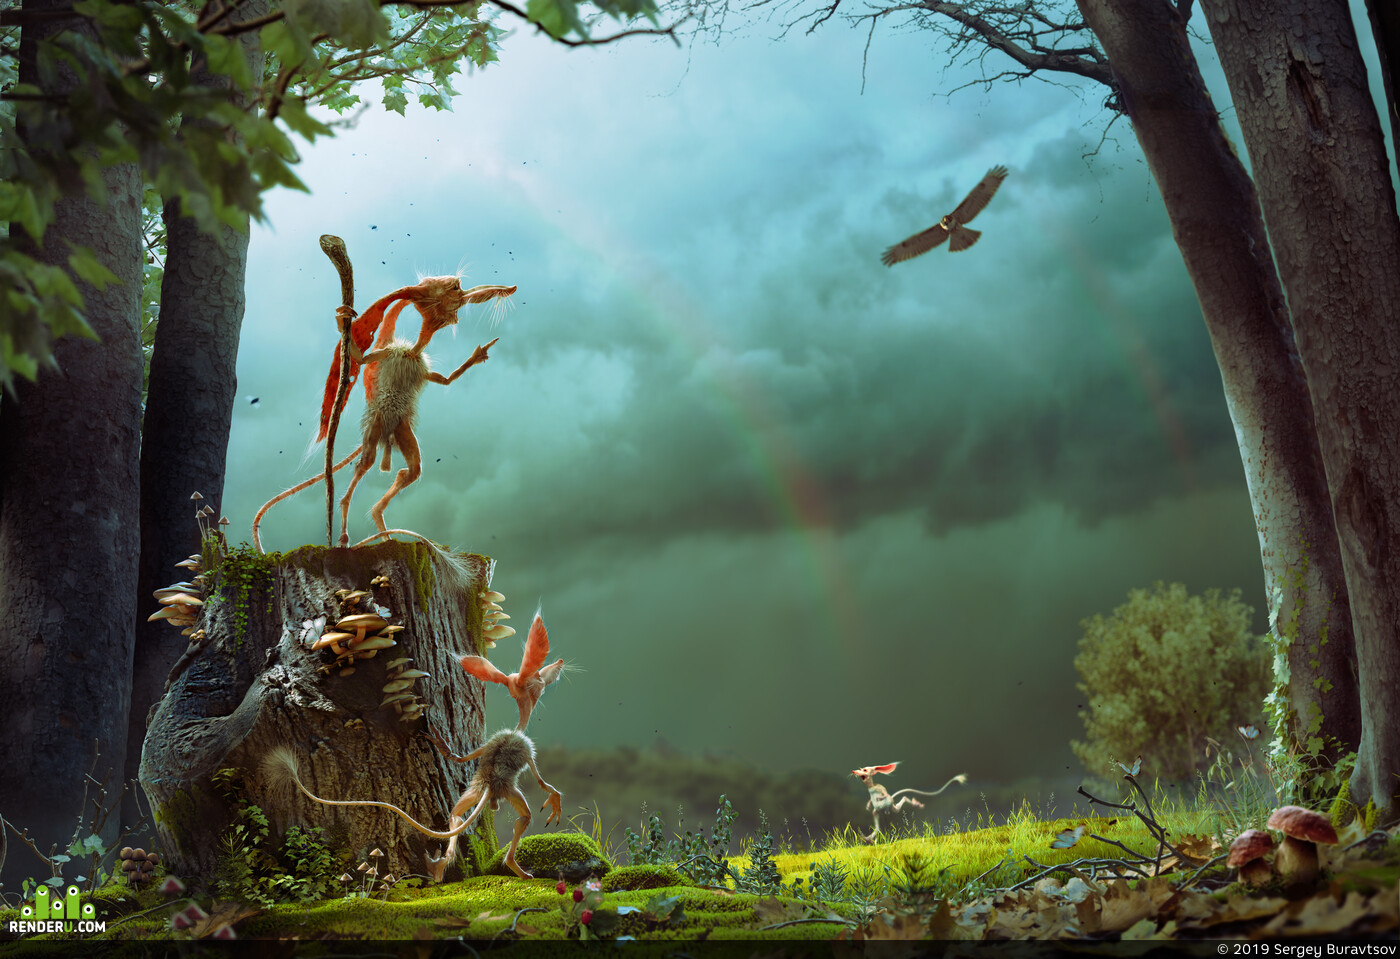 cgi, rain, creature, forest, pipidon, beforethestorm